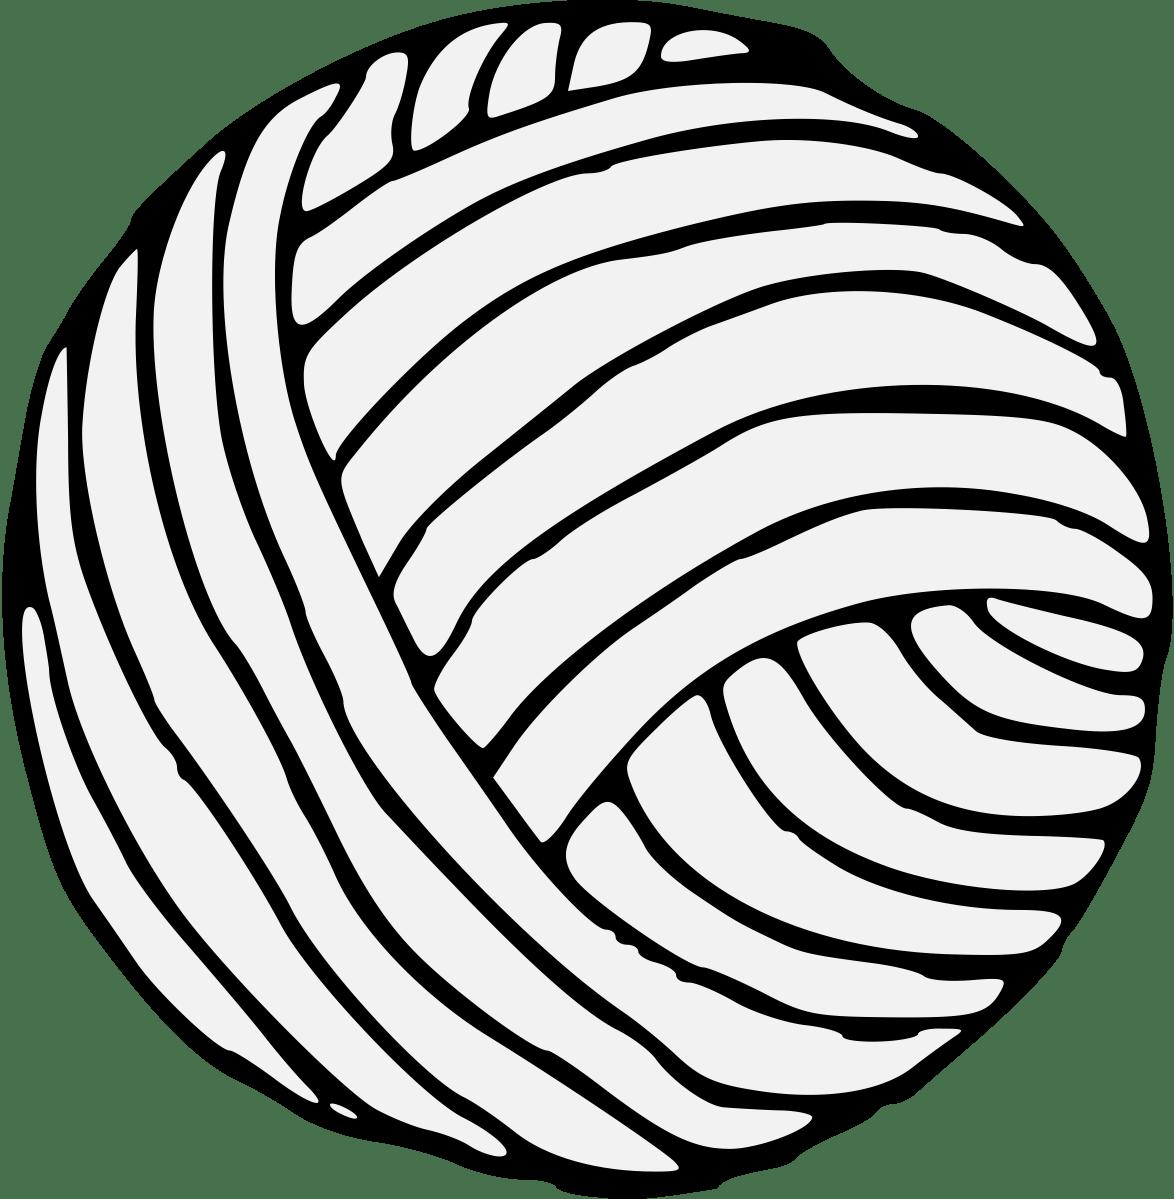 Yarn Ball Clip Art Sketch Coloring Page